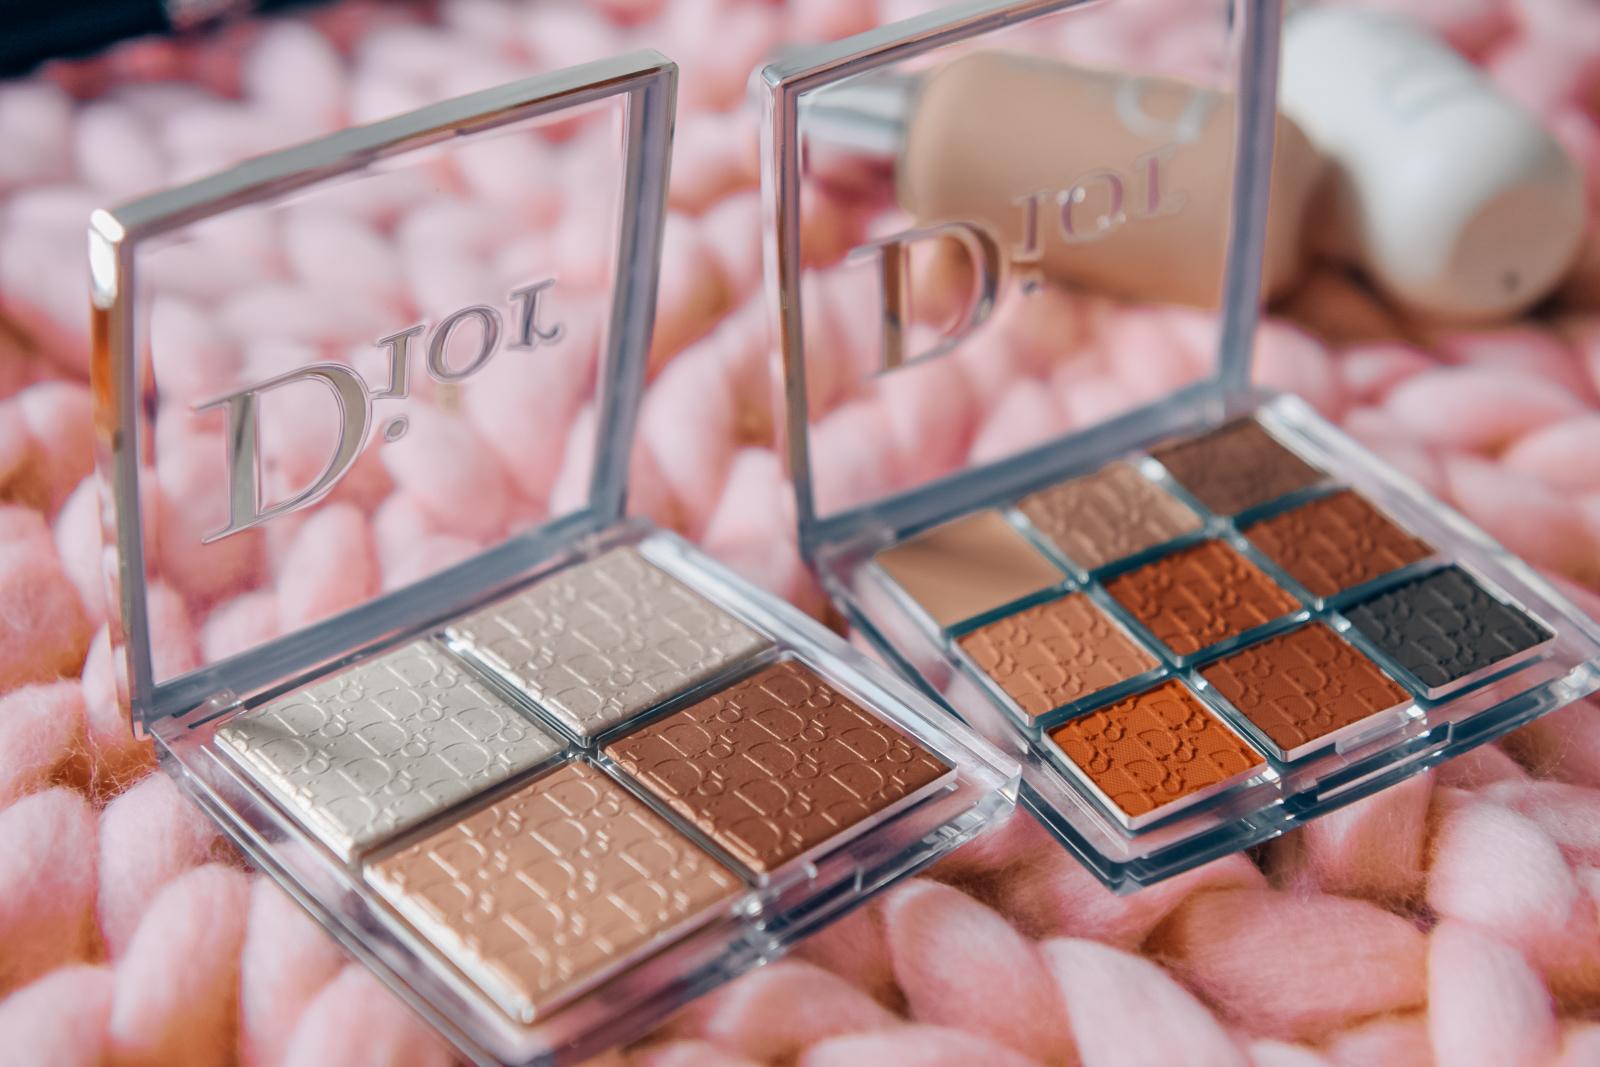 dior4-2